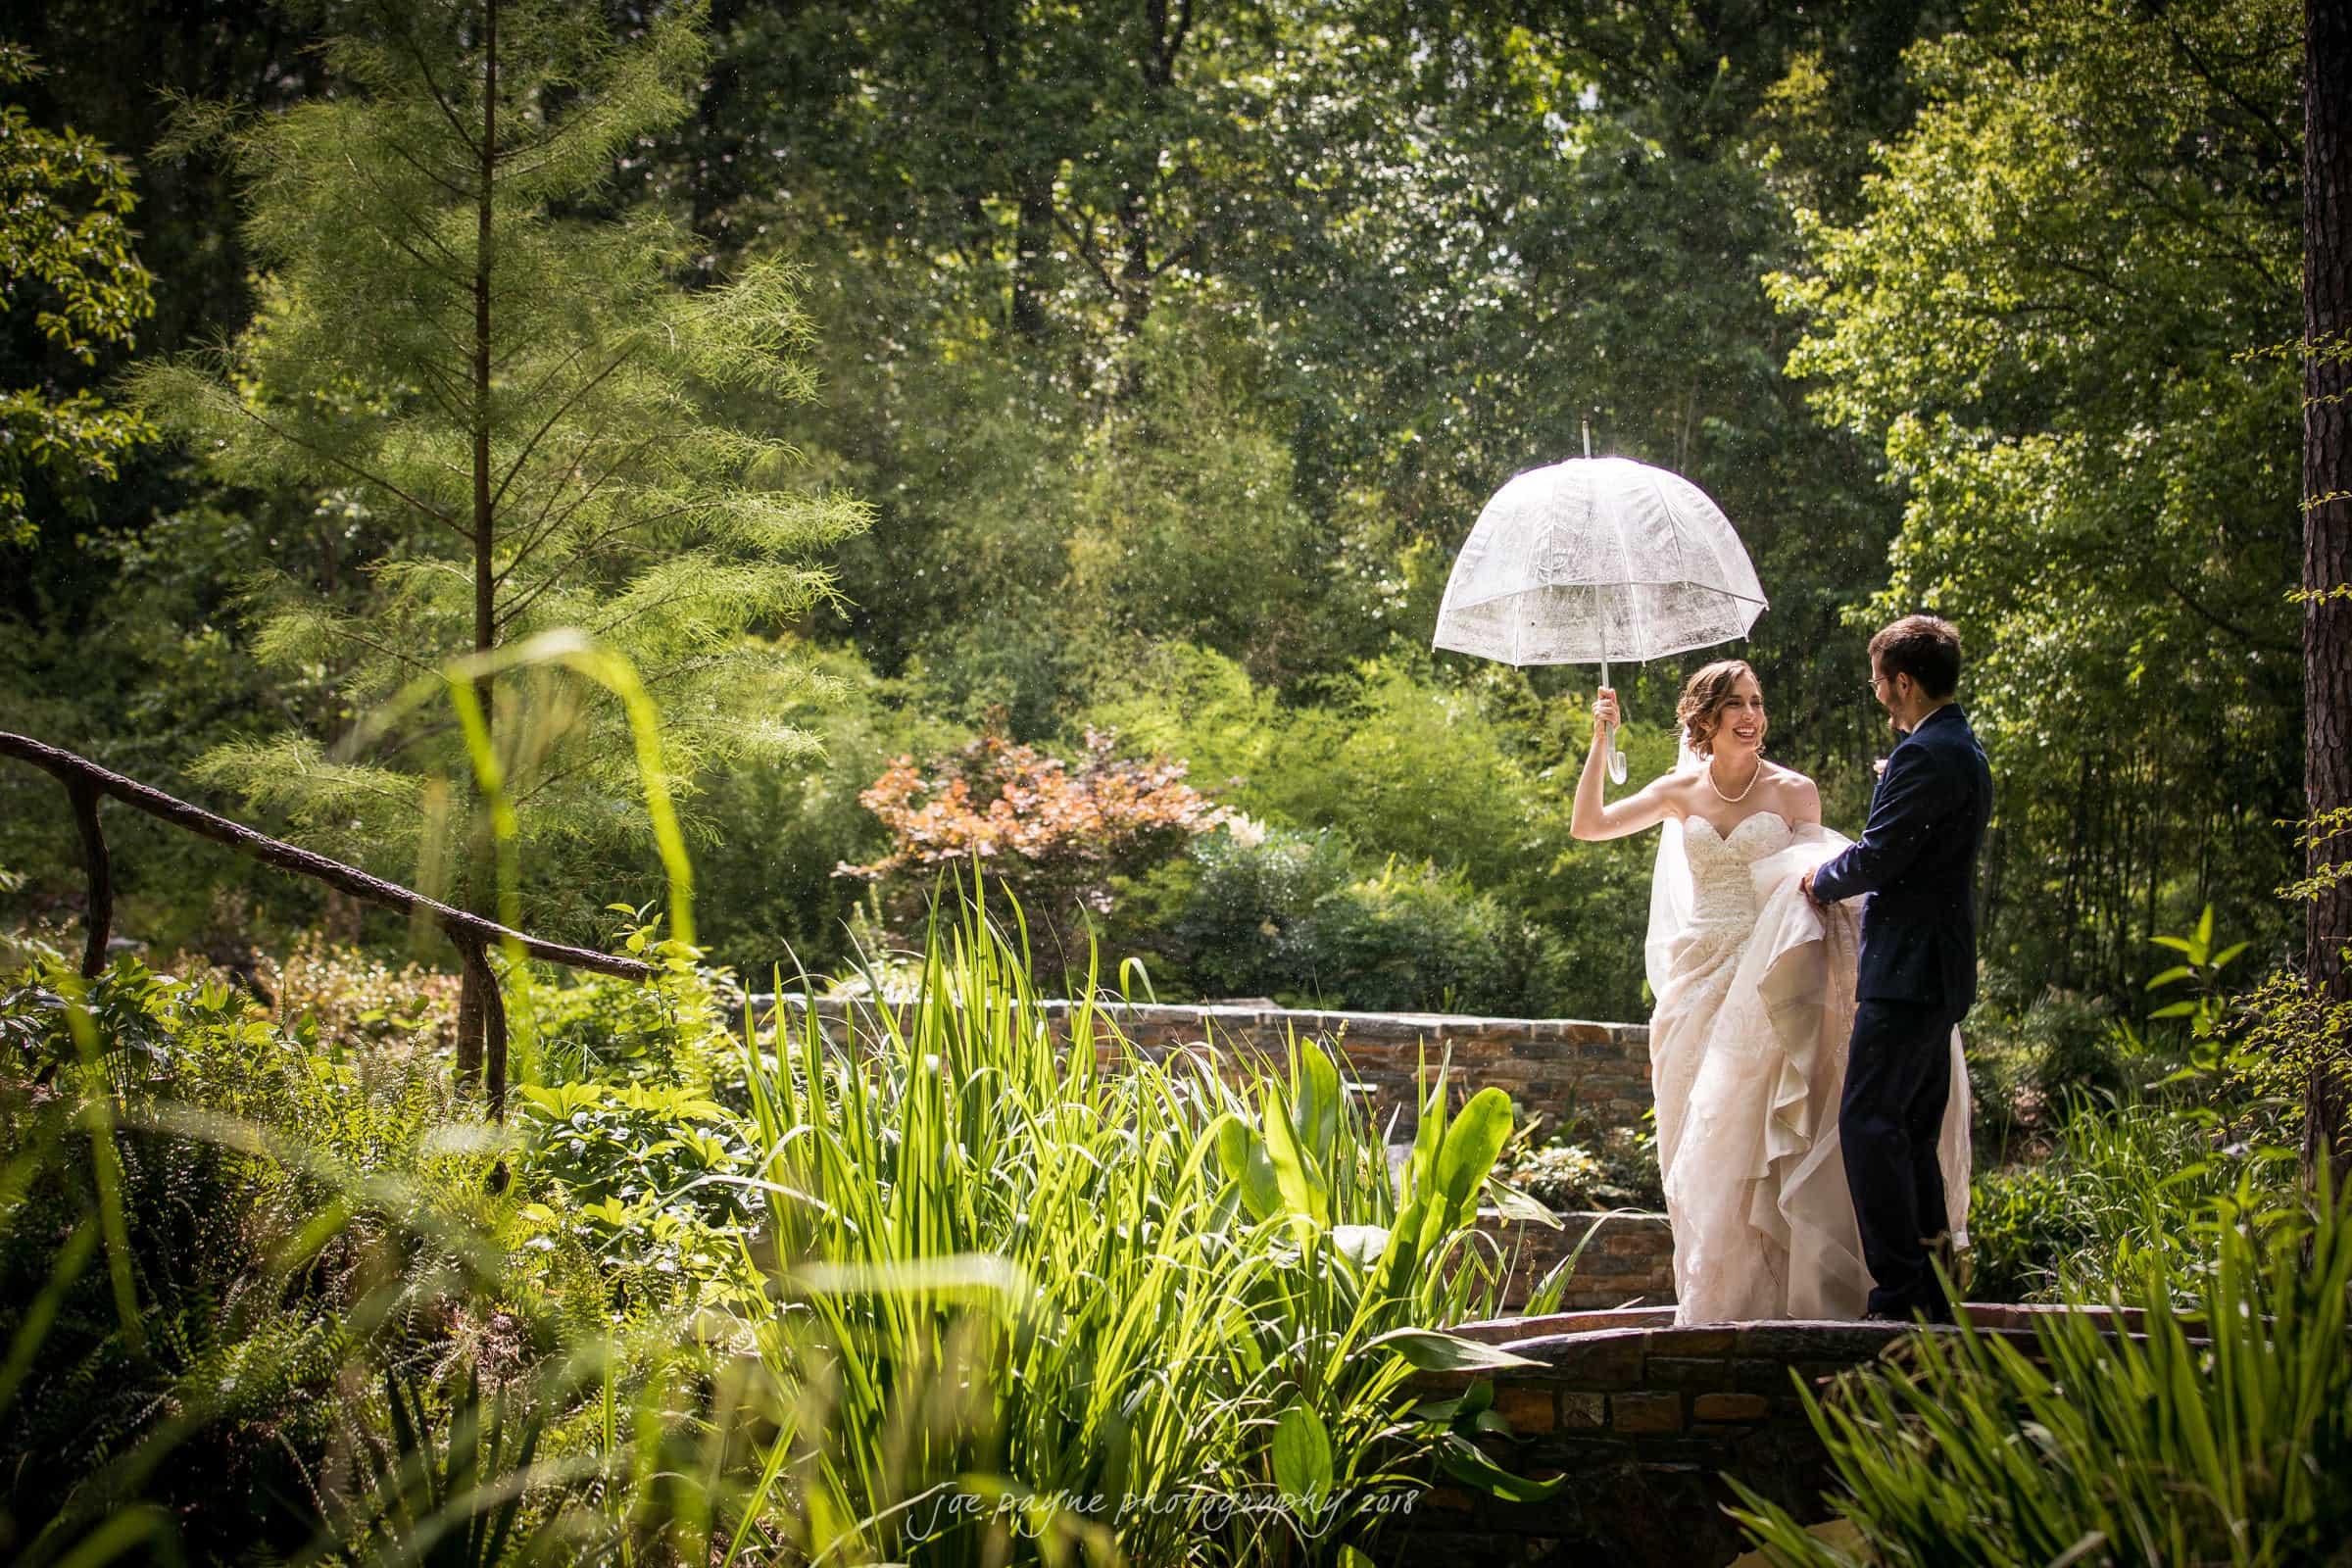 Duke-Gardens-Wedding-Couple-in-Rain-with-umbrella